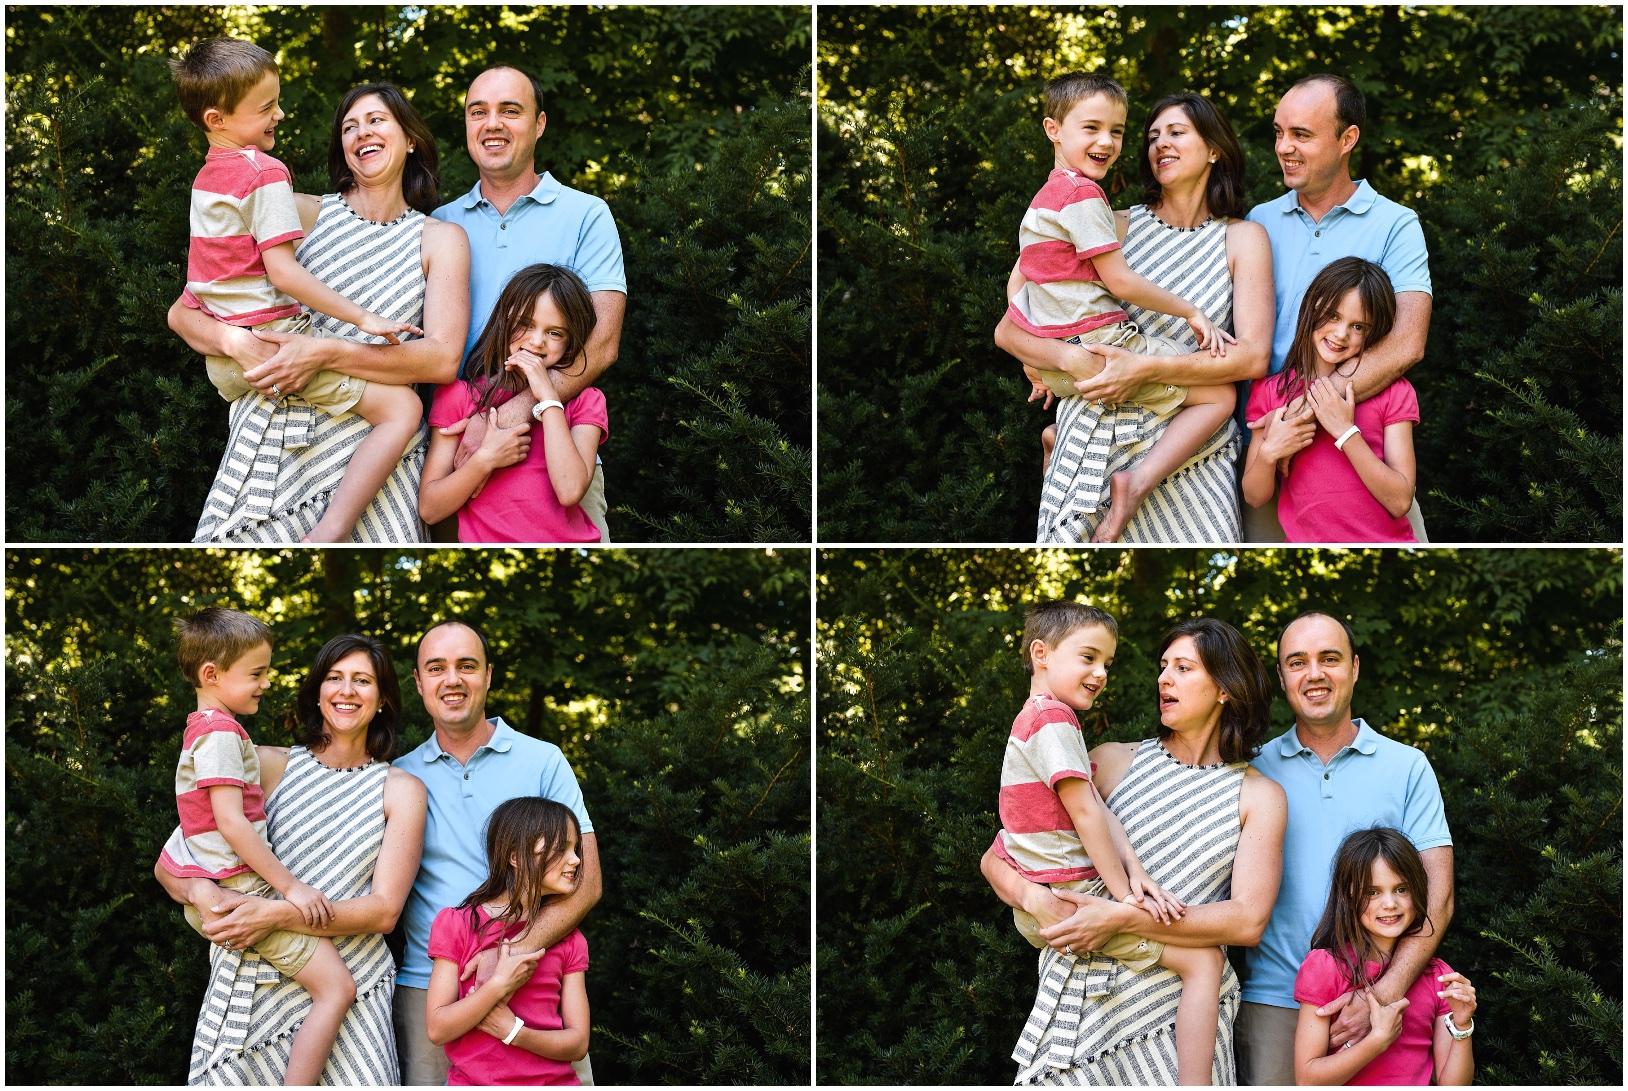 lindseyjane_family026.jpg